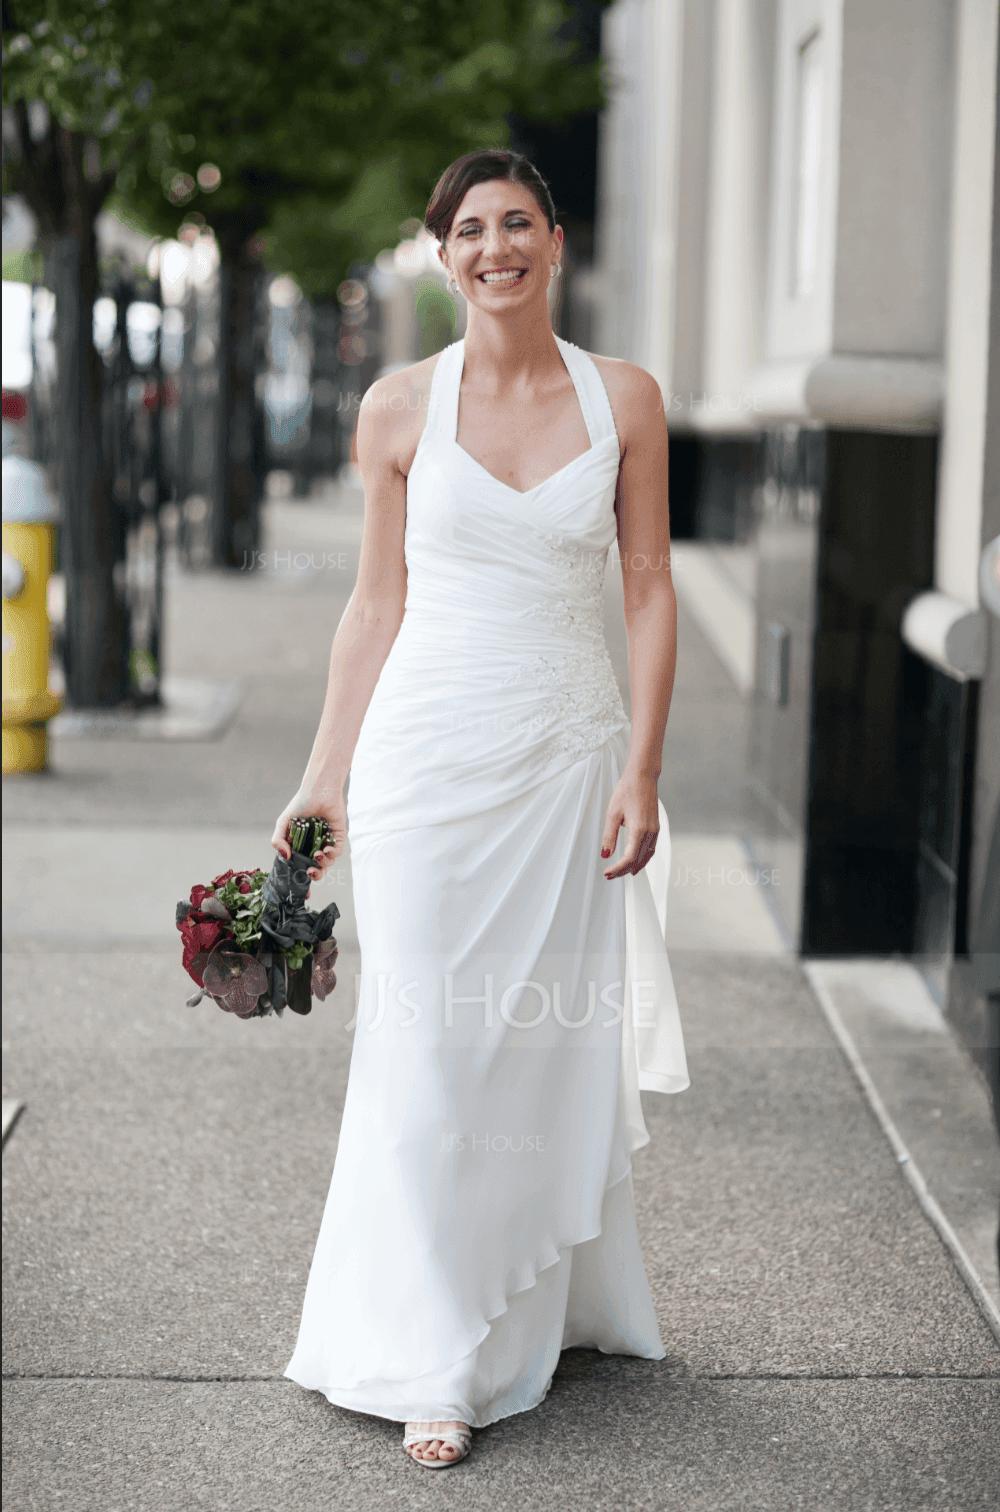 Sheath/Column Halter Floor-Length Chiffon Satin Wedding Dress With Ruffle Beading Appliques Lace Sequins (002012582)